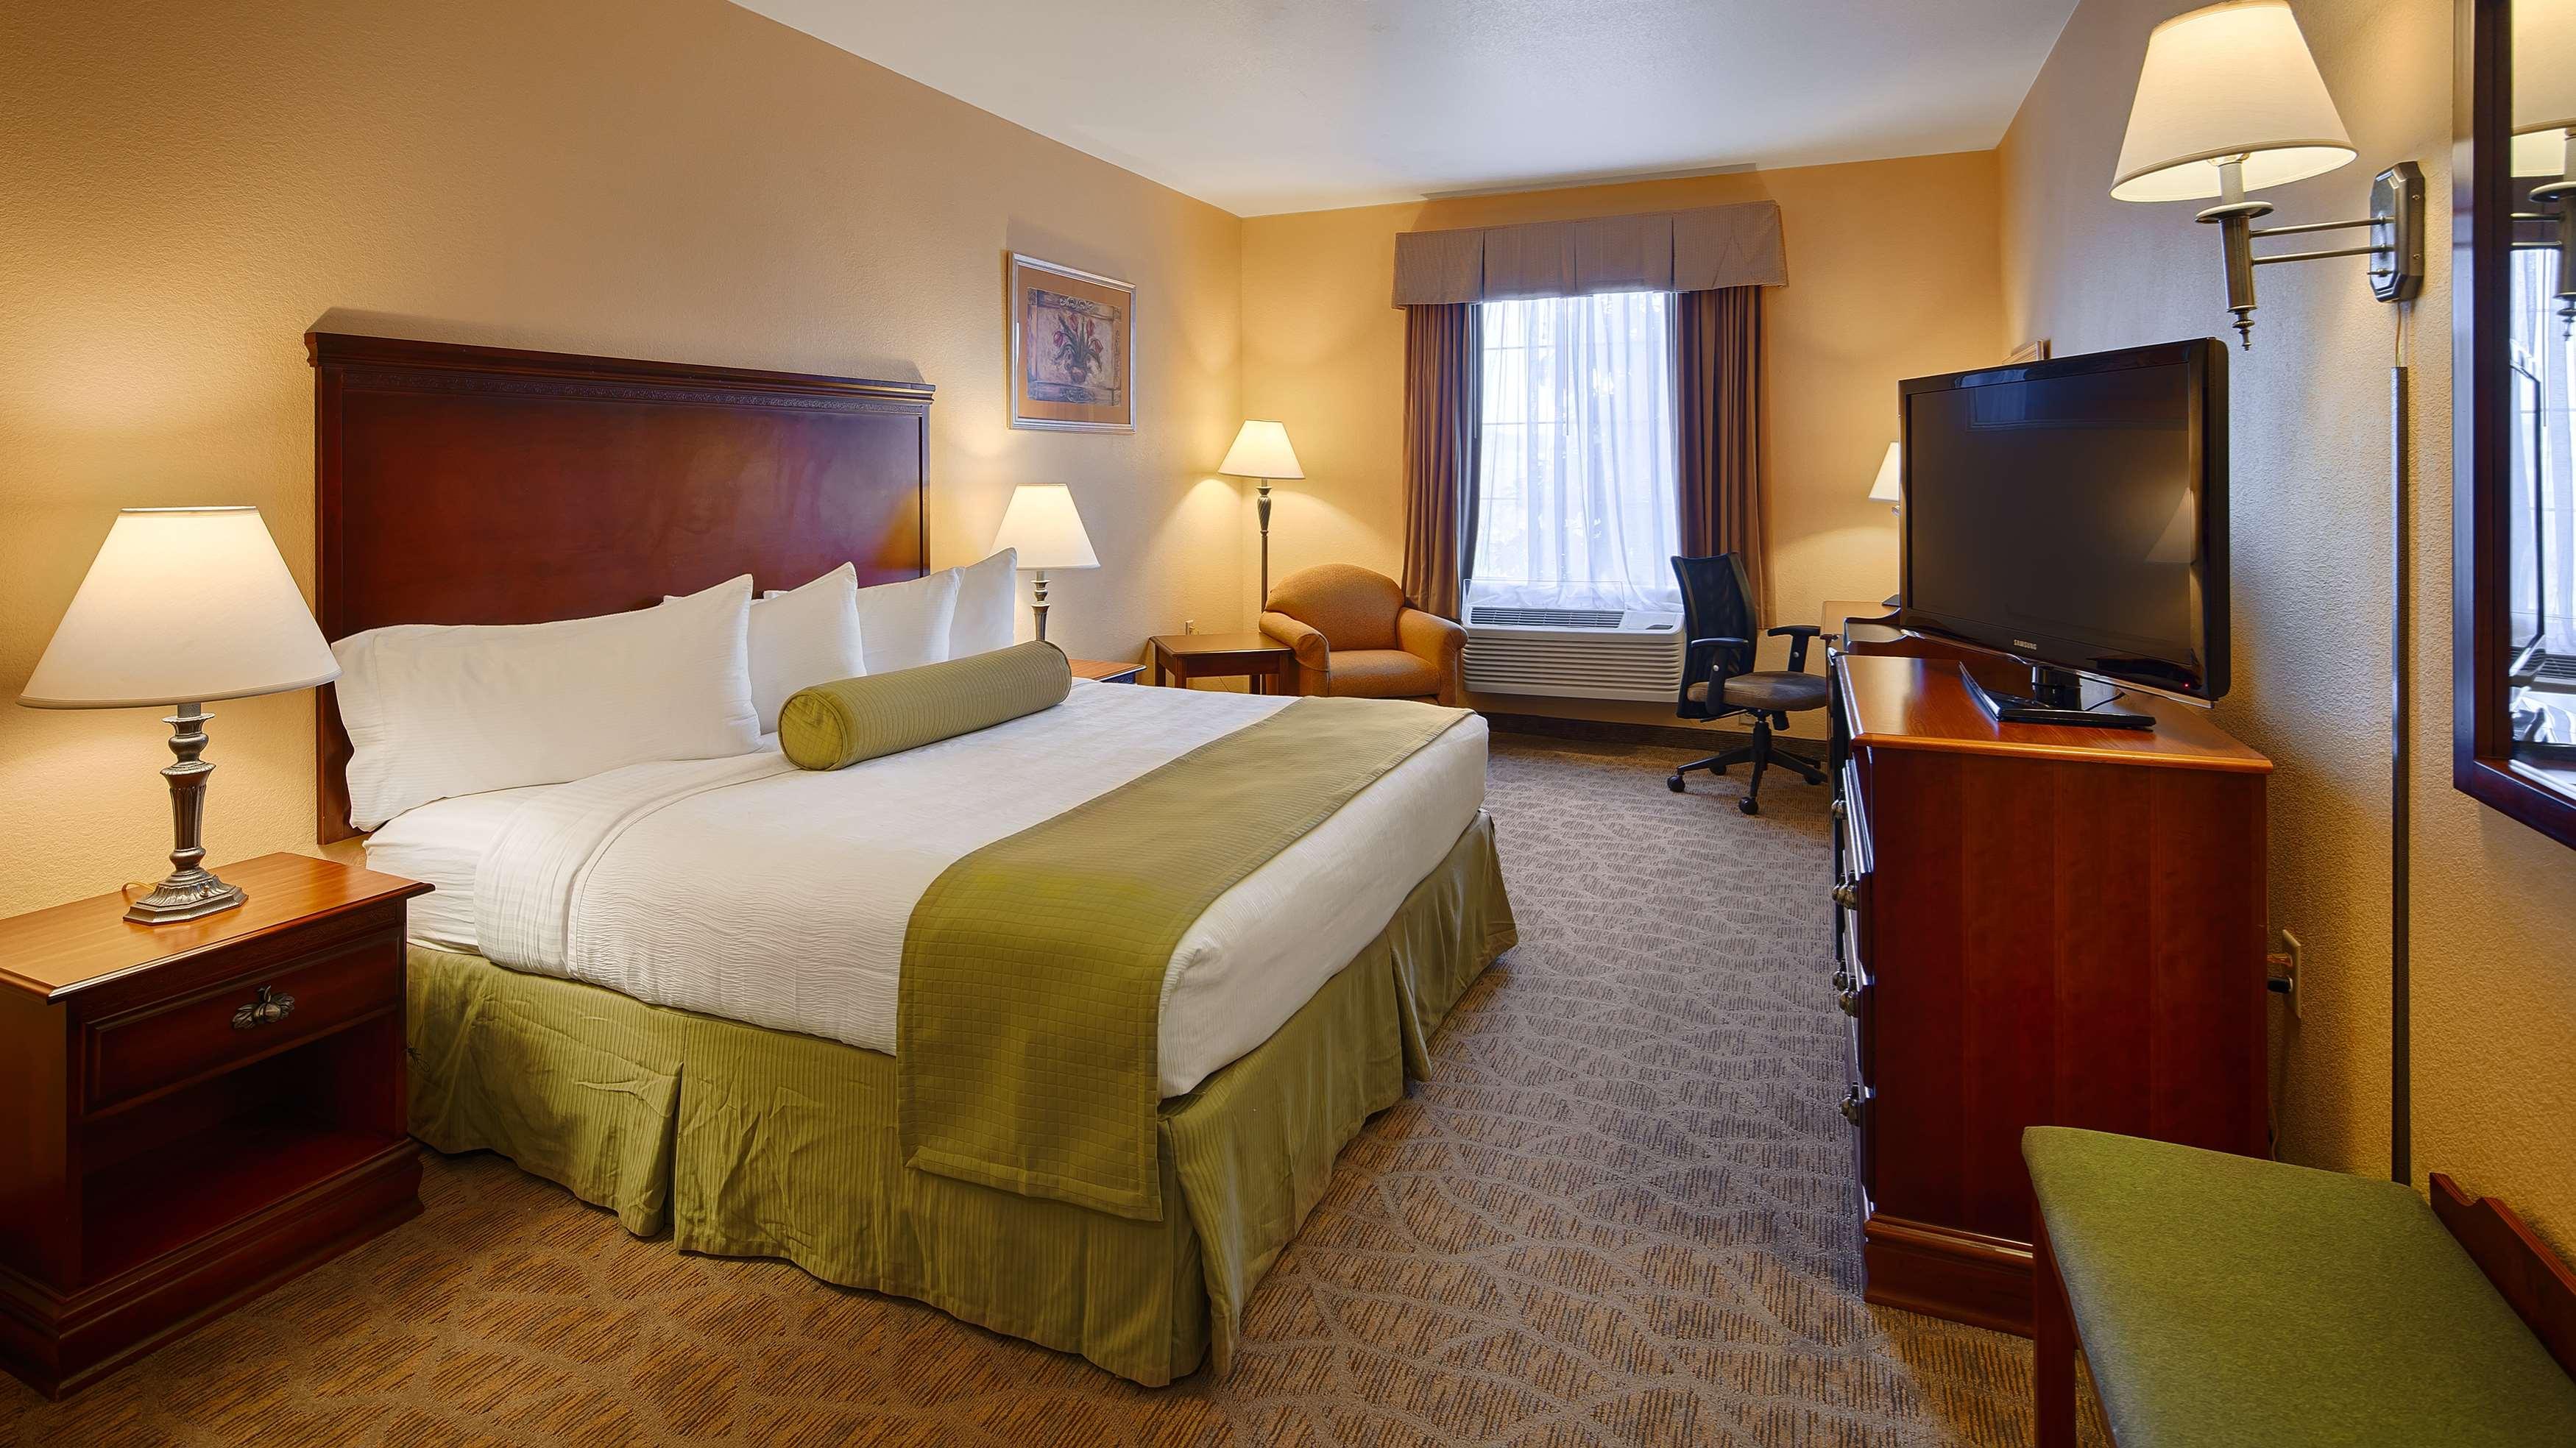 Best Western Plus Executive Hotel & Suites image 28